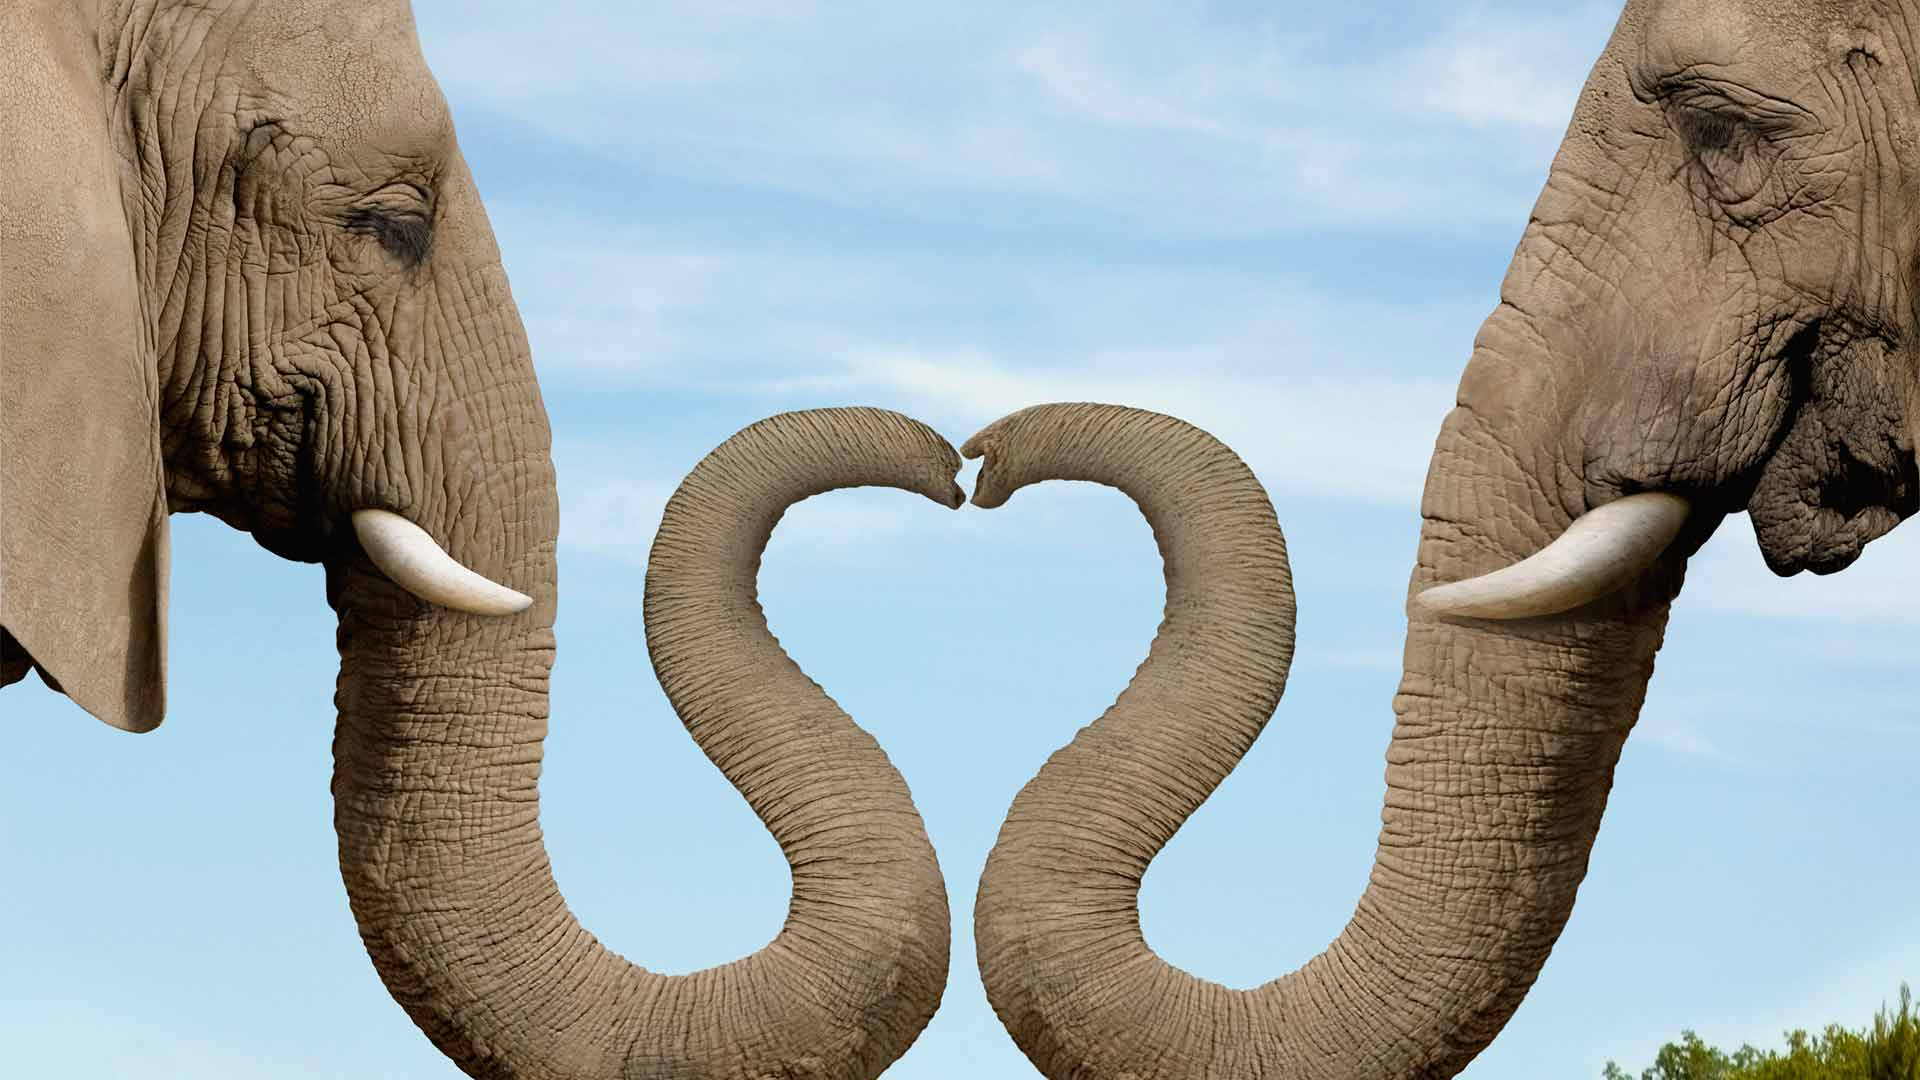 Wallpaper download elephant - Love Nose Cute Elephant Wallpaper Animal Desktop Background